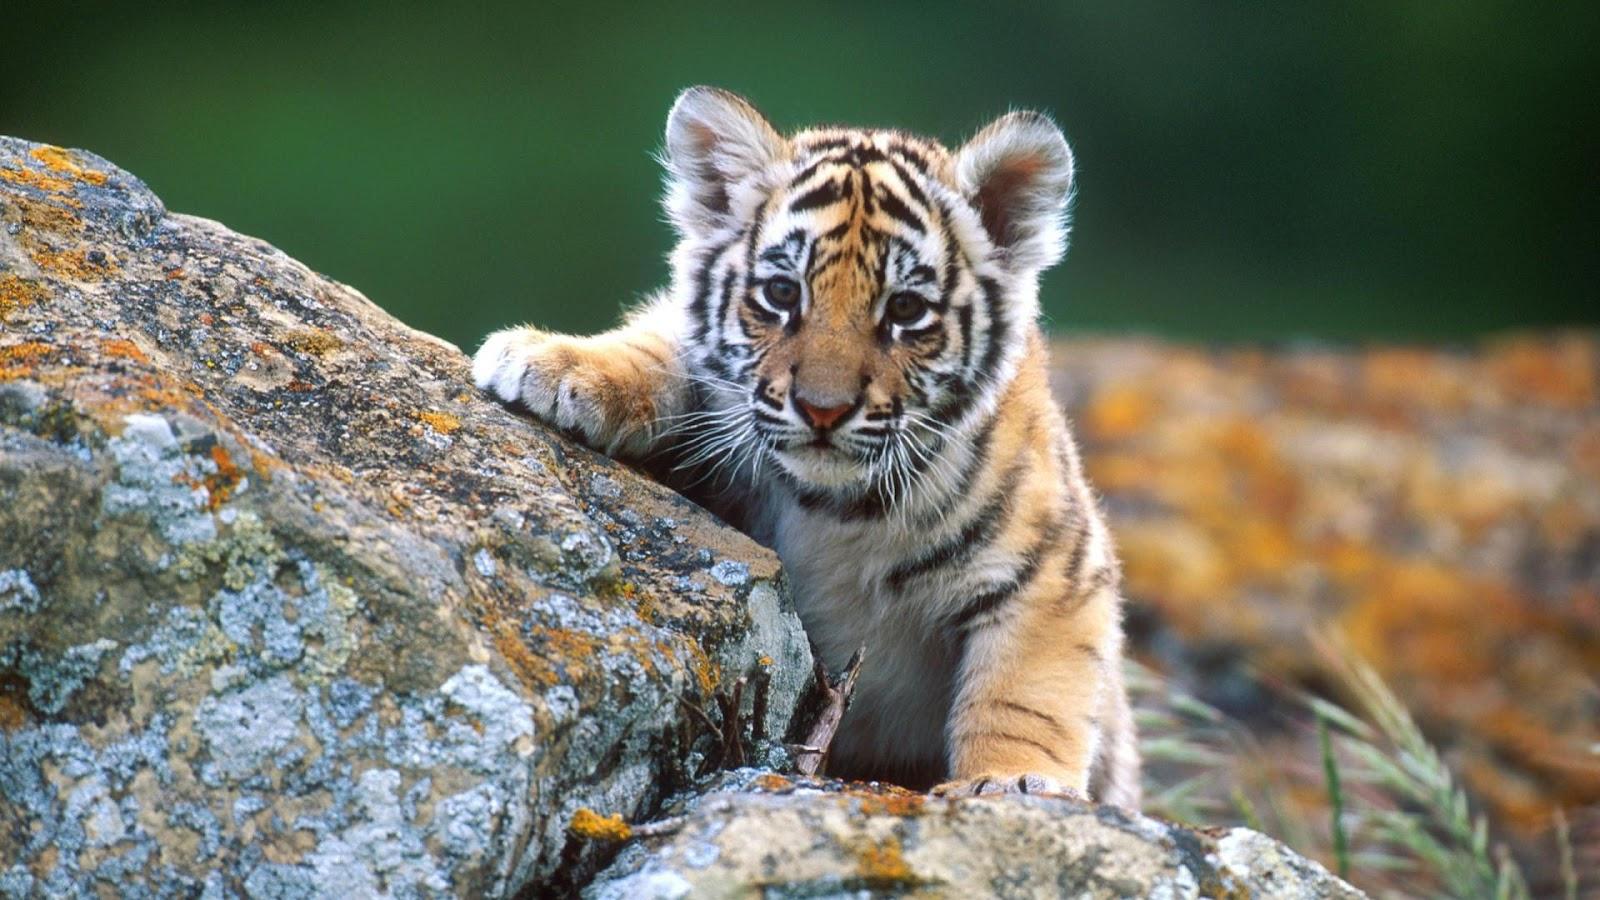 baby animal wallpaper | Free desktop wallpapers - WallpaperToon